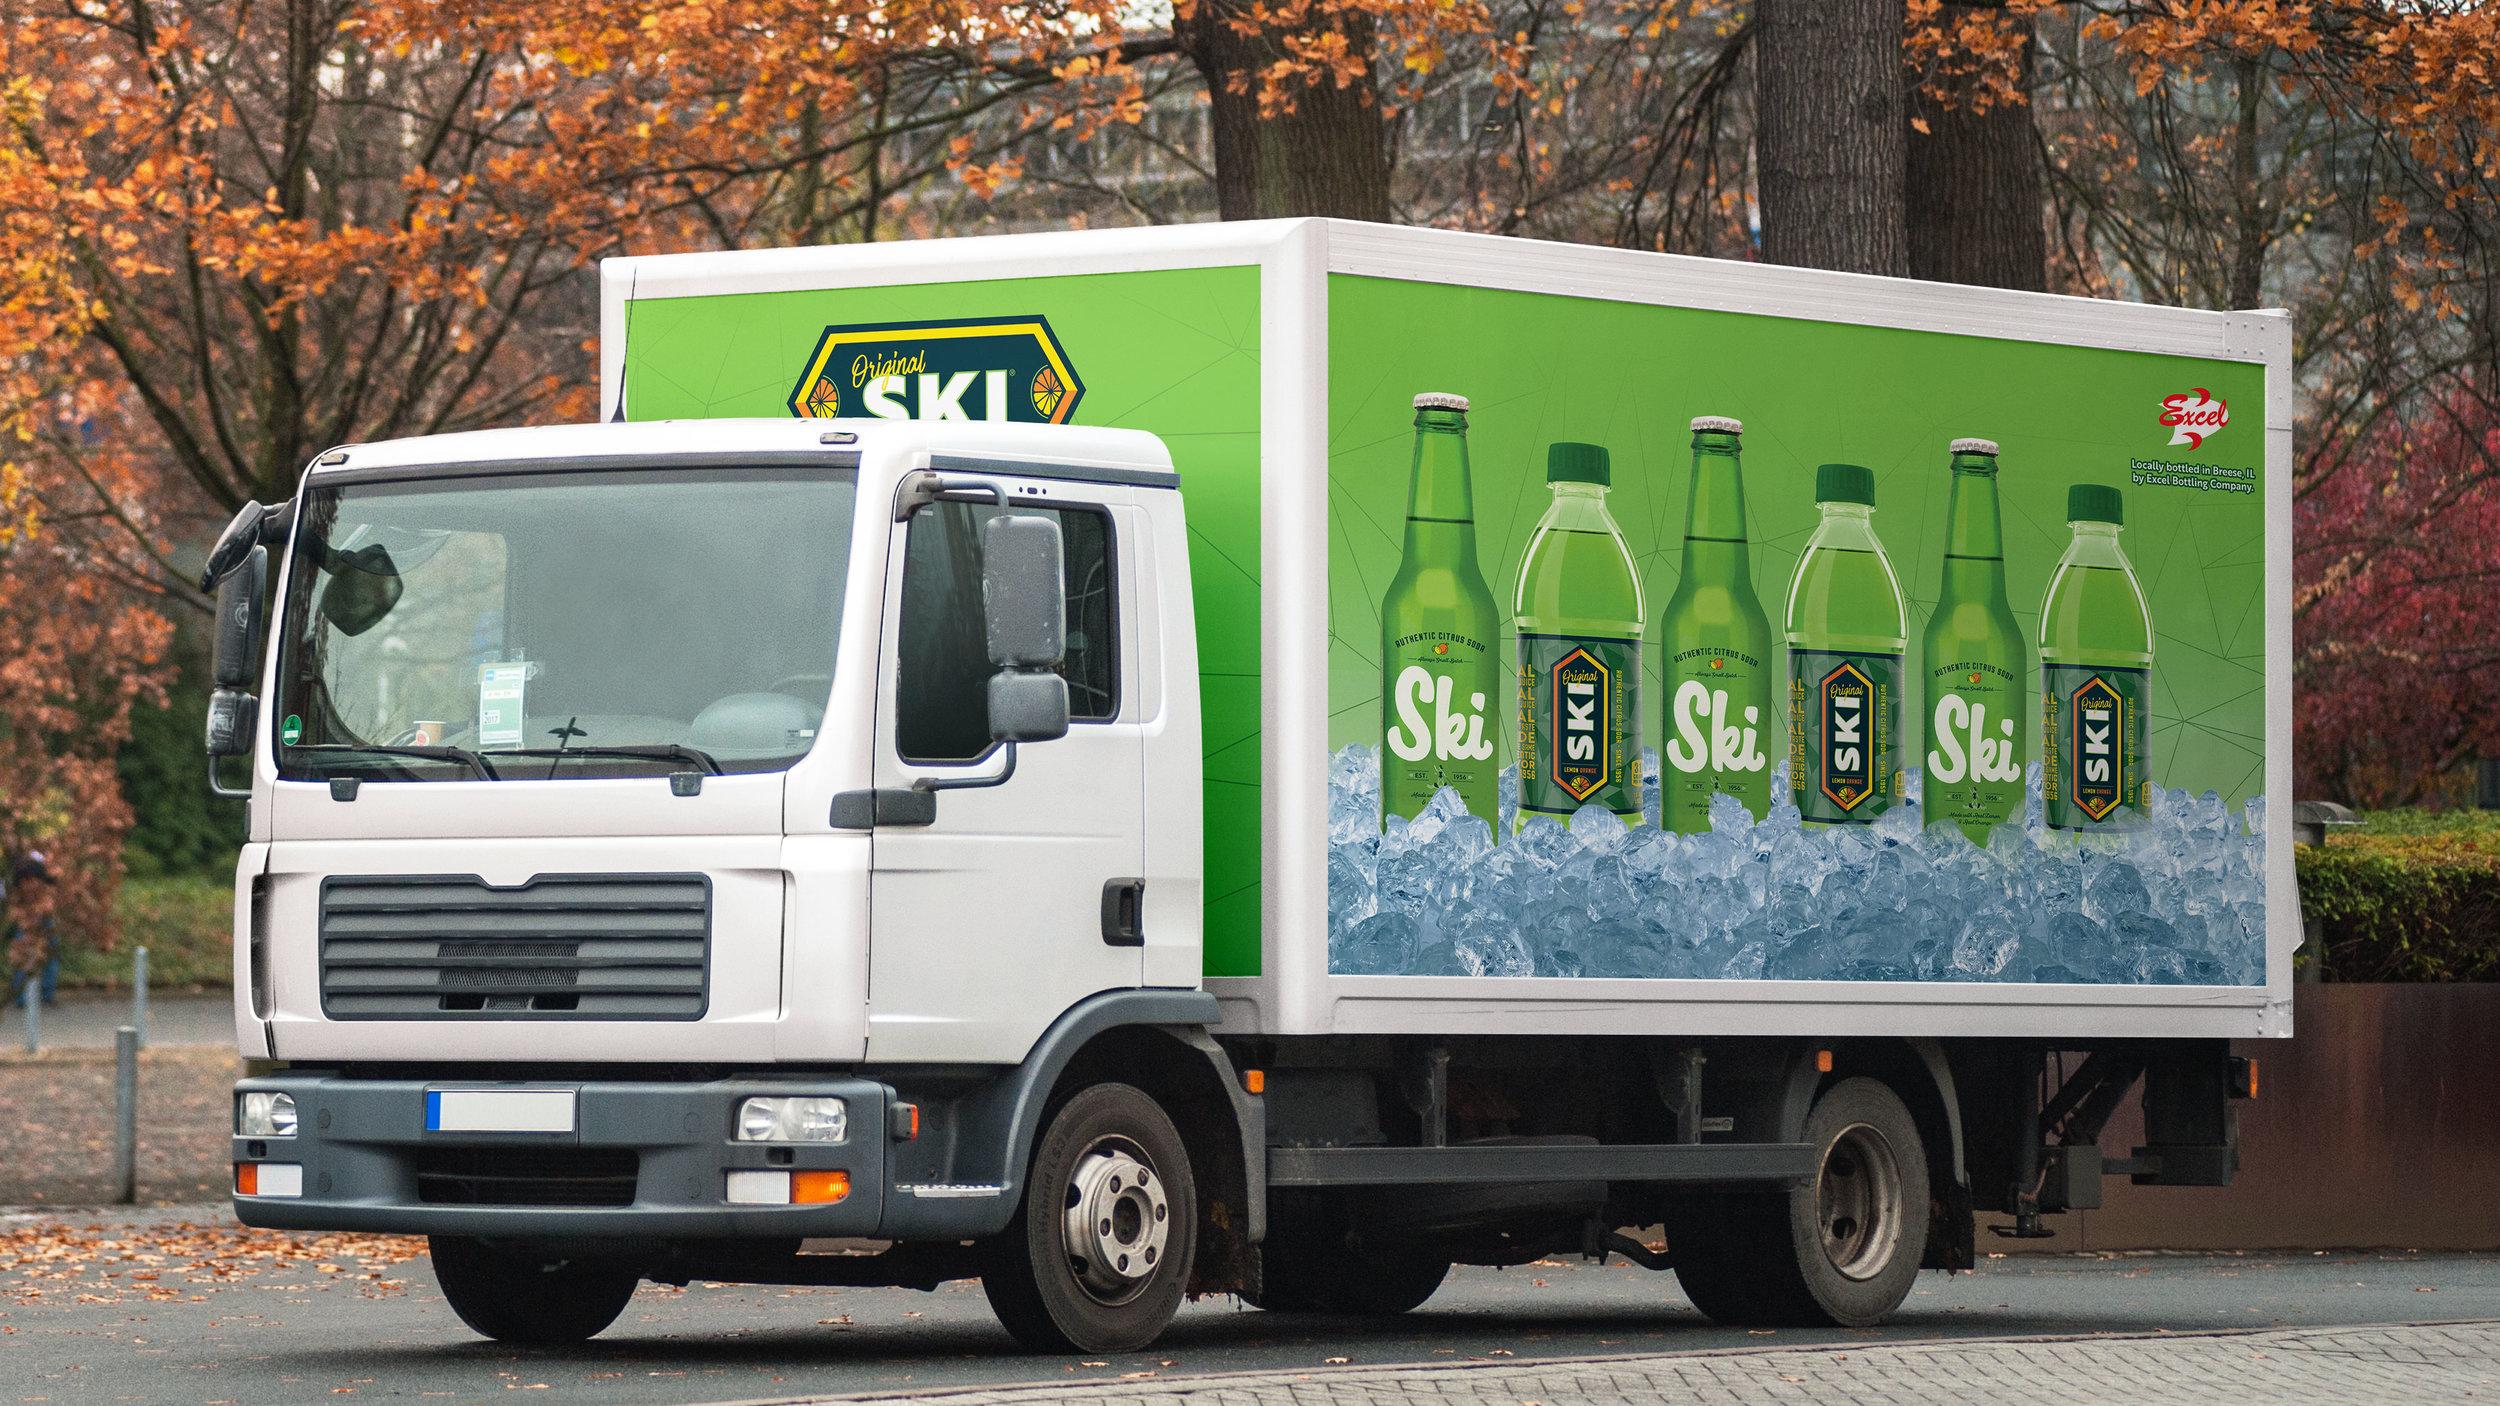 ski_truck.jpg